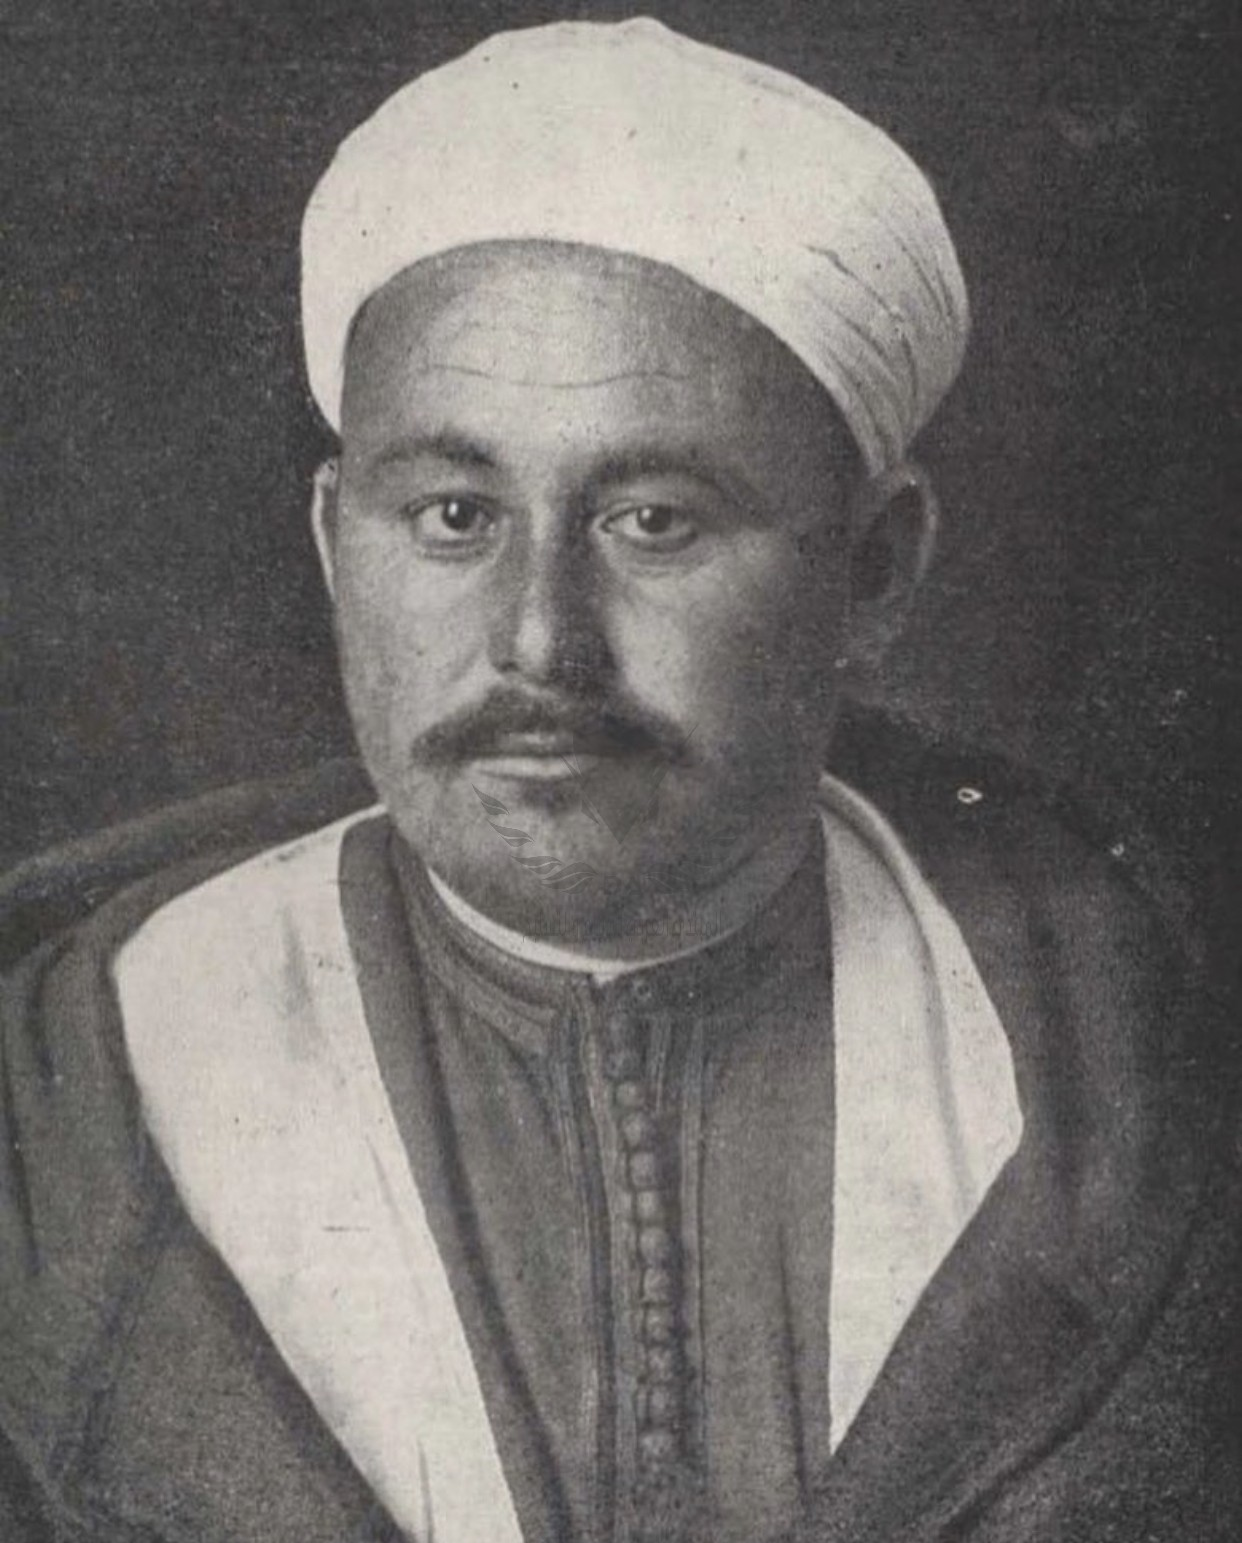 Portrait_president_abd_el_krim_1922.jpg